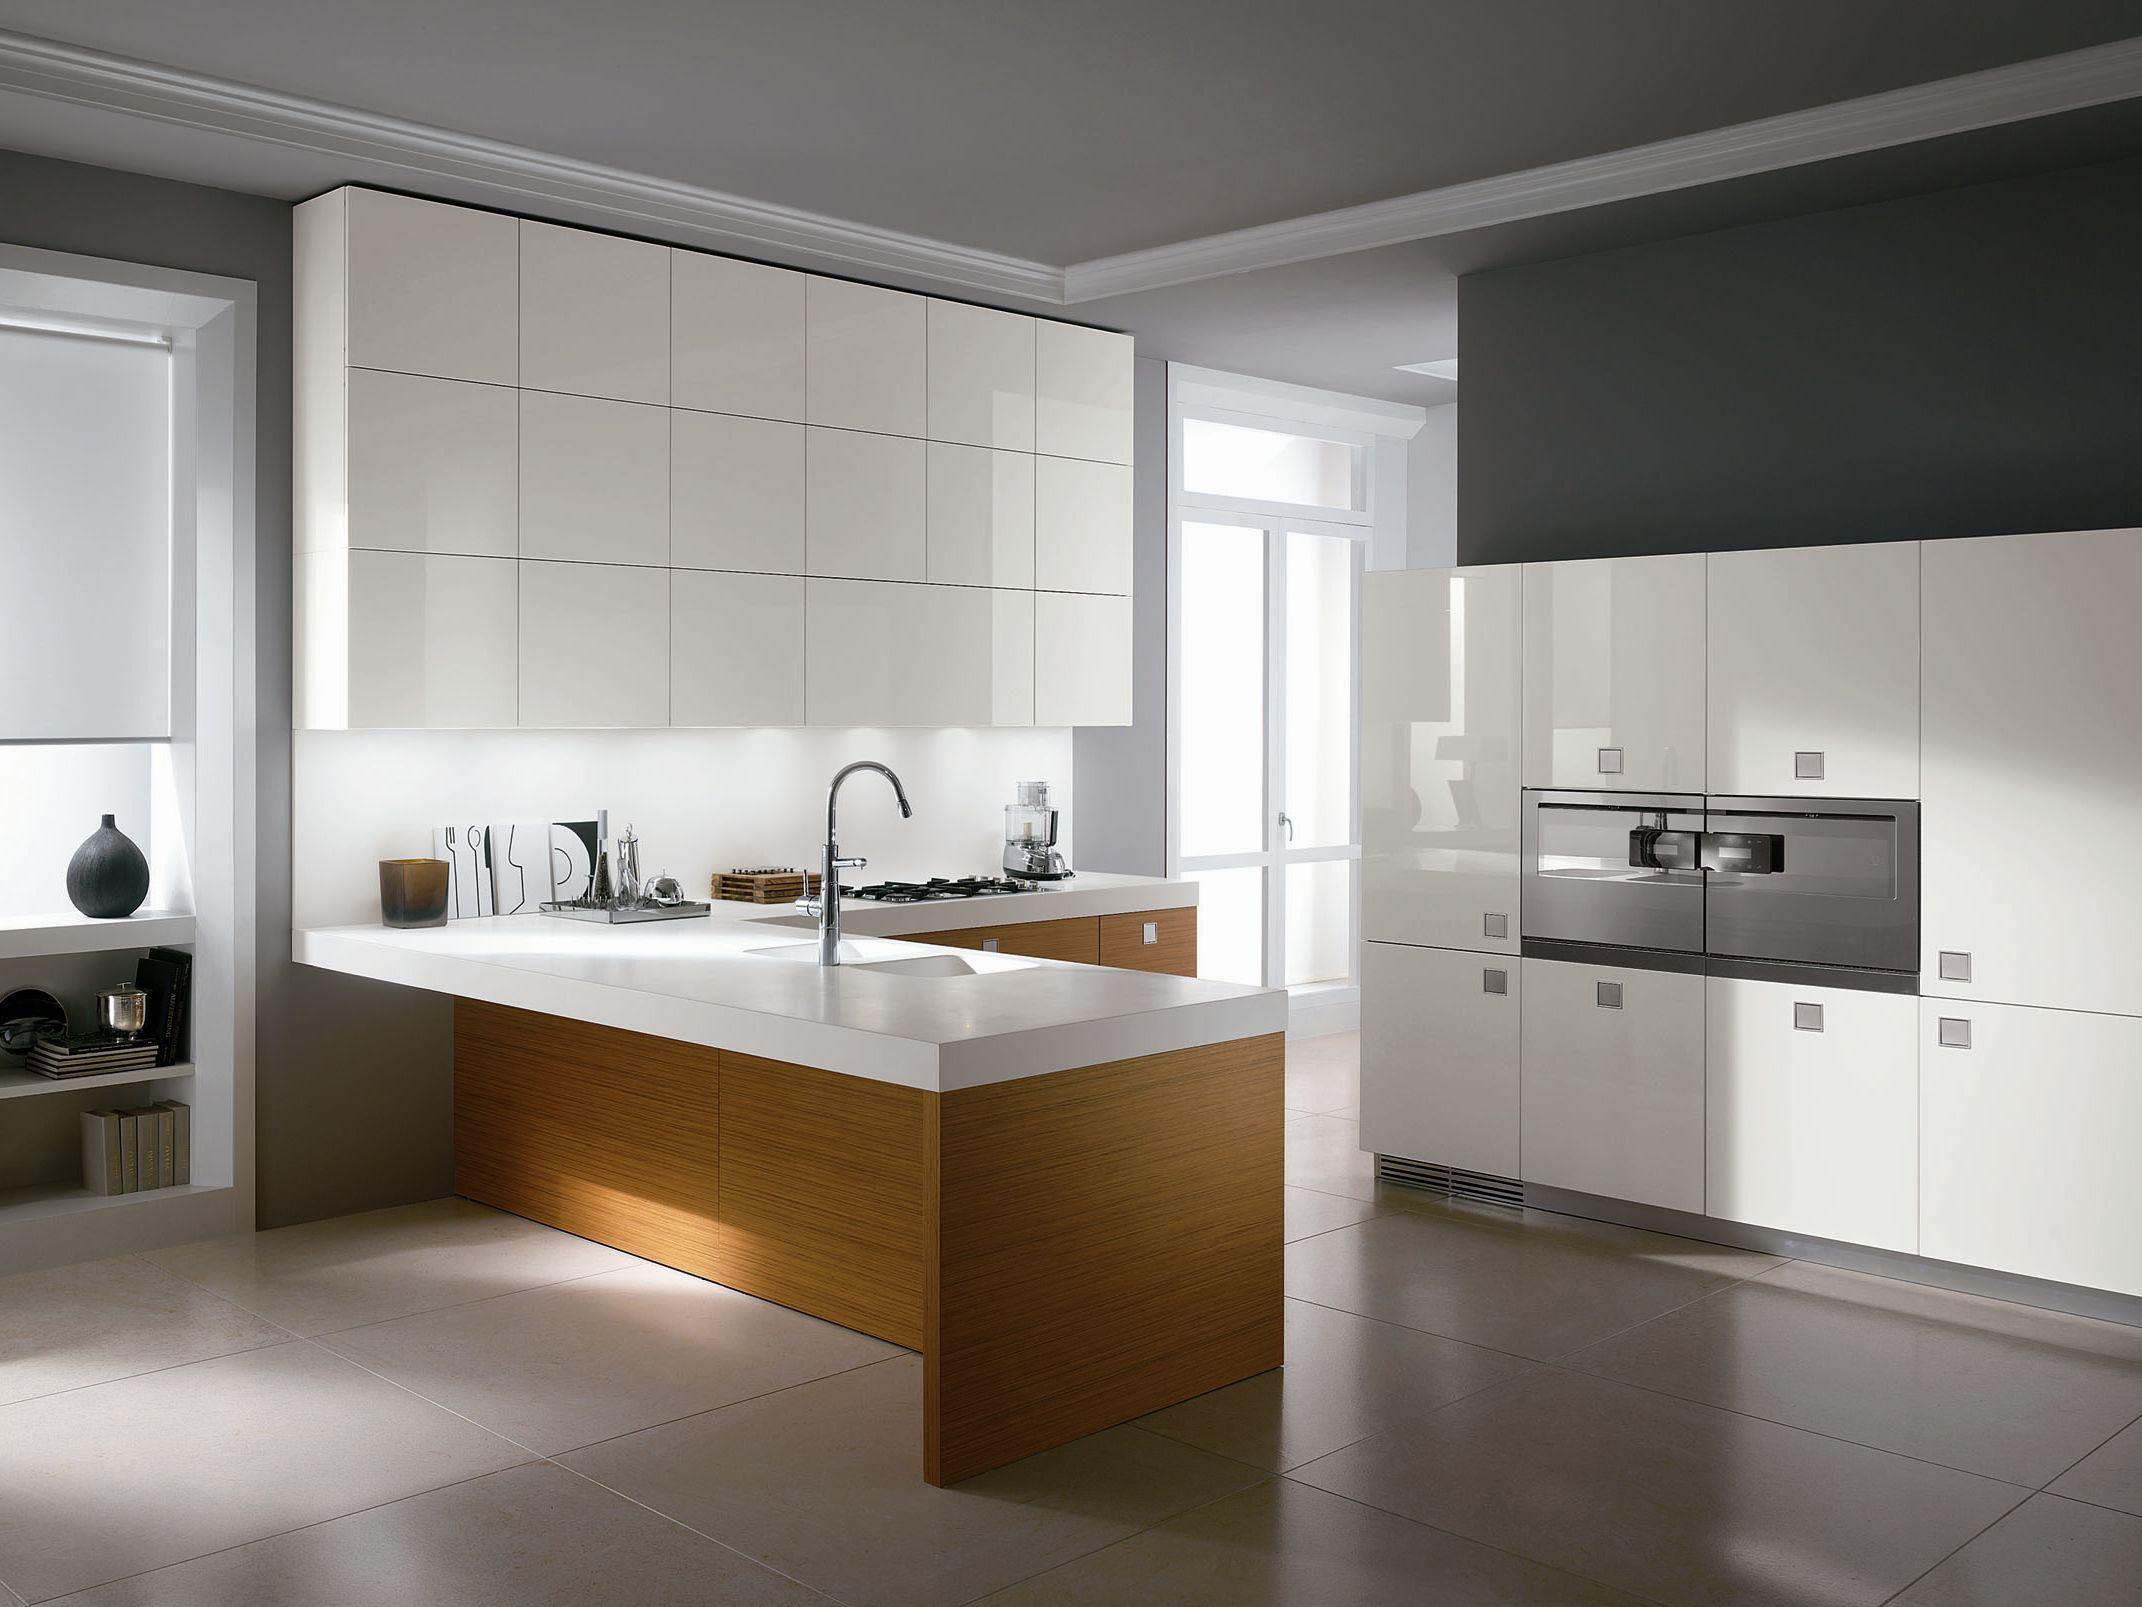 Cucina laccata in rovere con maniglie silverbox high - Maniglie da cucina ...